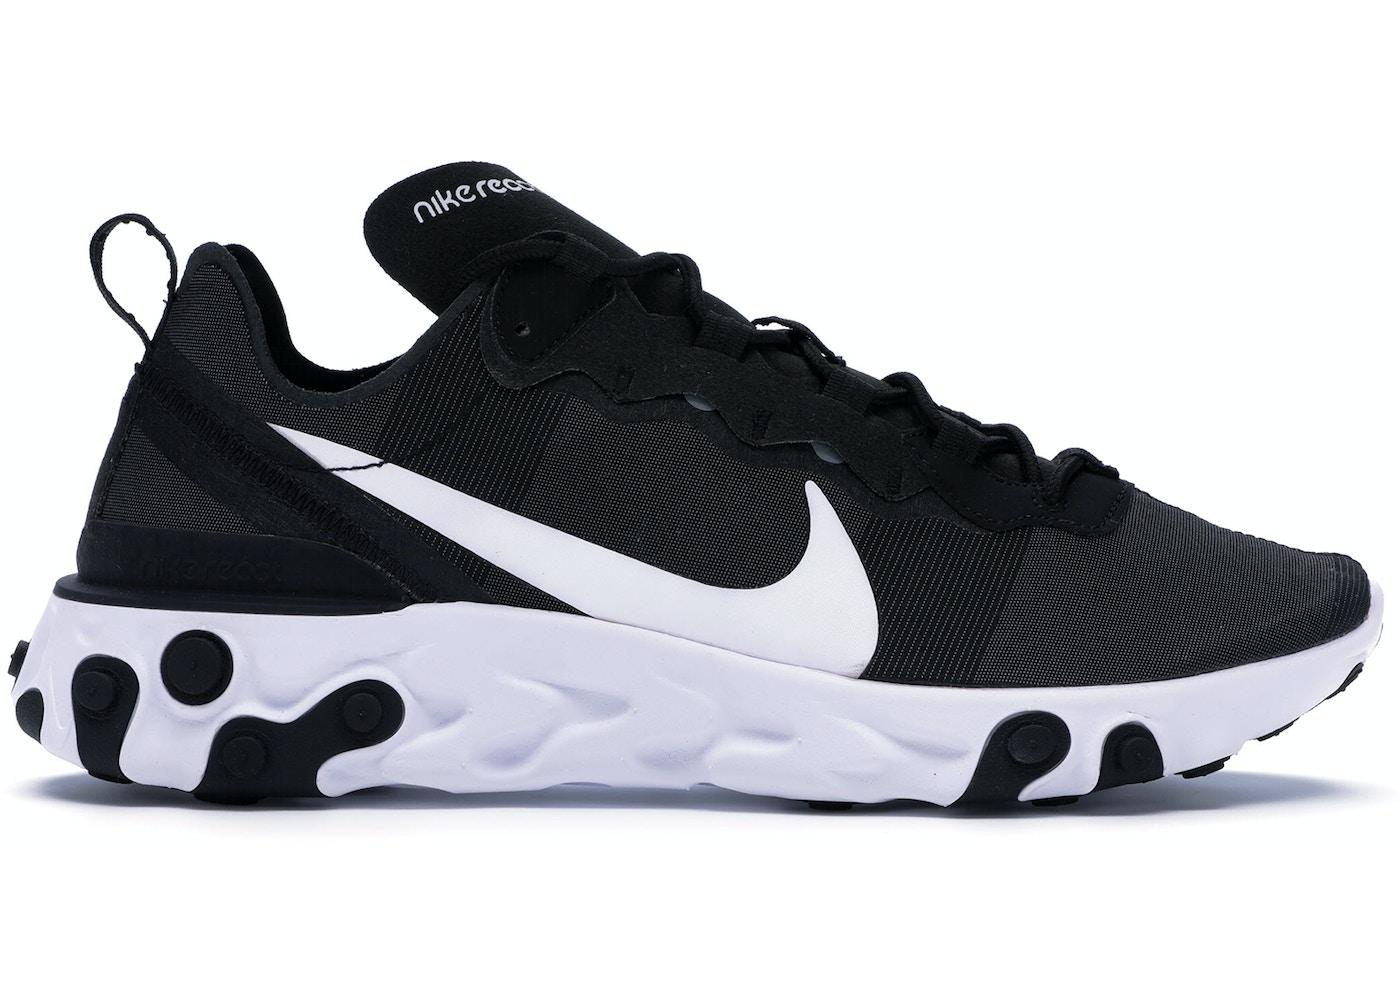 e36aa7b24017 Nike React Element 55 Black White - BQ6166-003